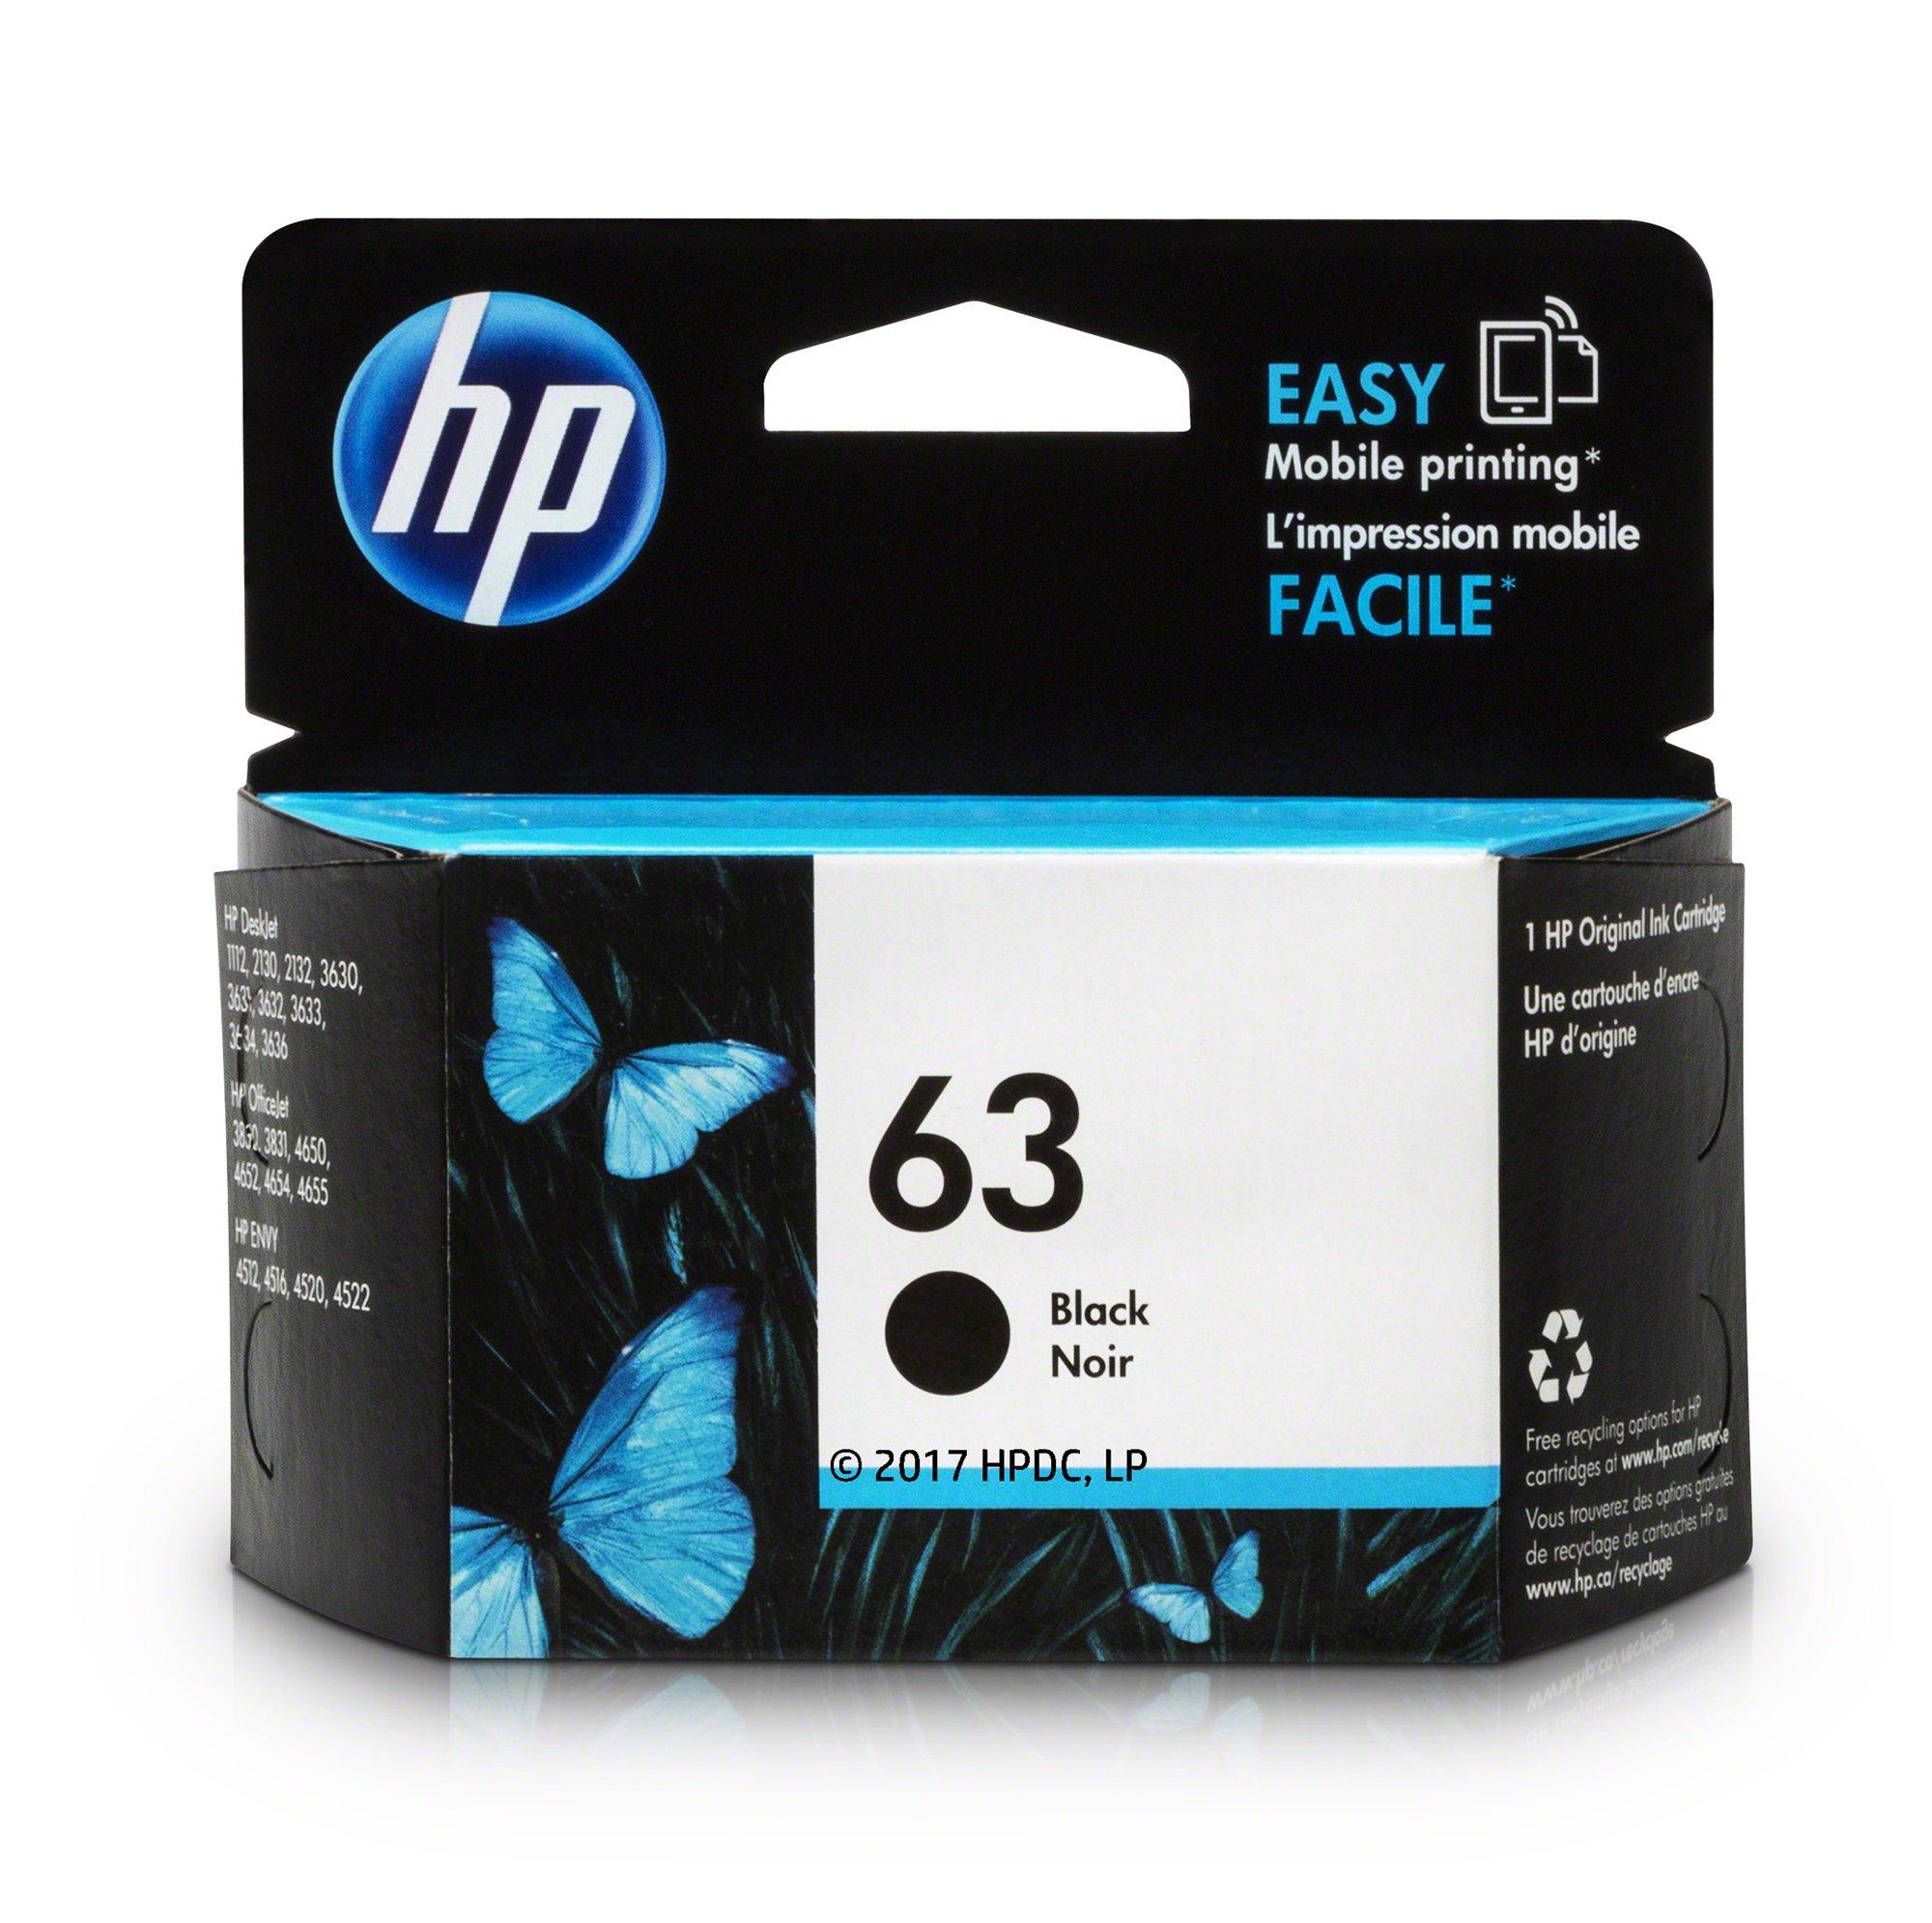 HP 63 Black Original Ink Cartridge (F6U62AN) for HP Deskjet 1112 2130 2132 3630 3632 3633 3634 3636 3637 HP Envy 4512 4513 4520 4523 4524 HP Officejet 3830 3831 3833 4650 4652 4654 4655